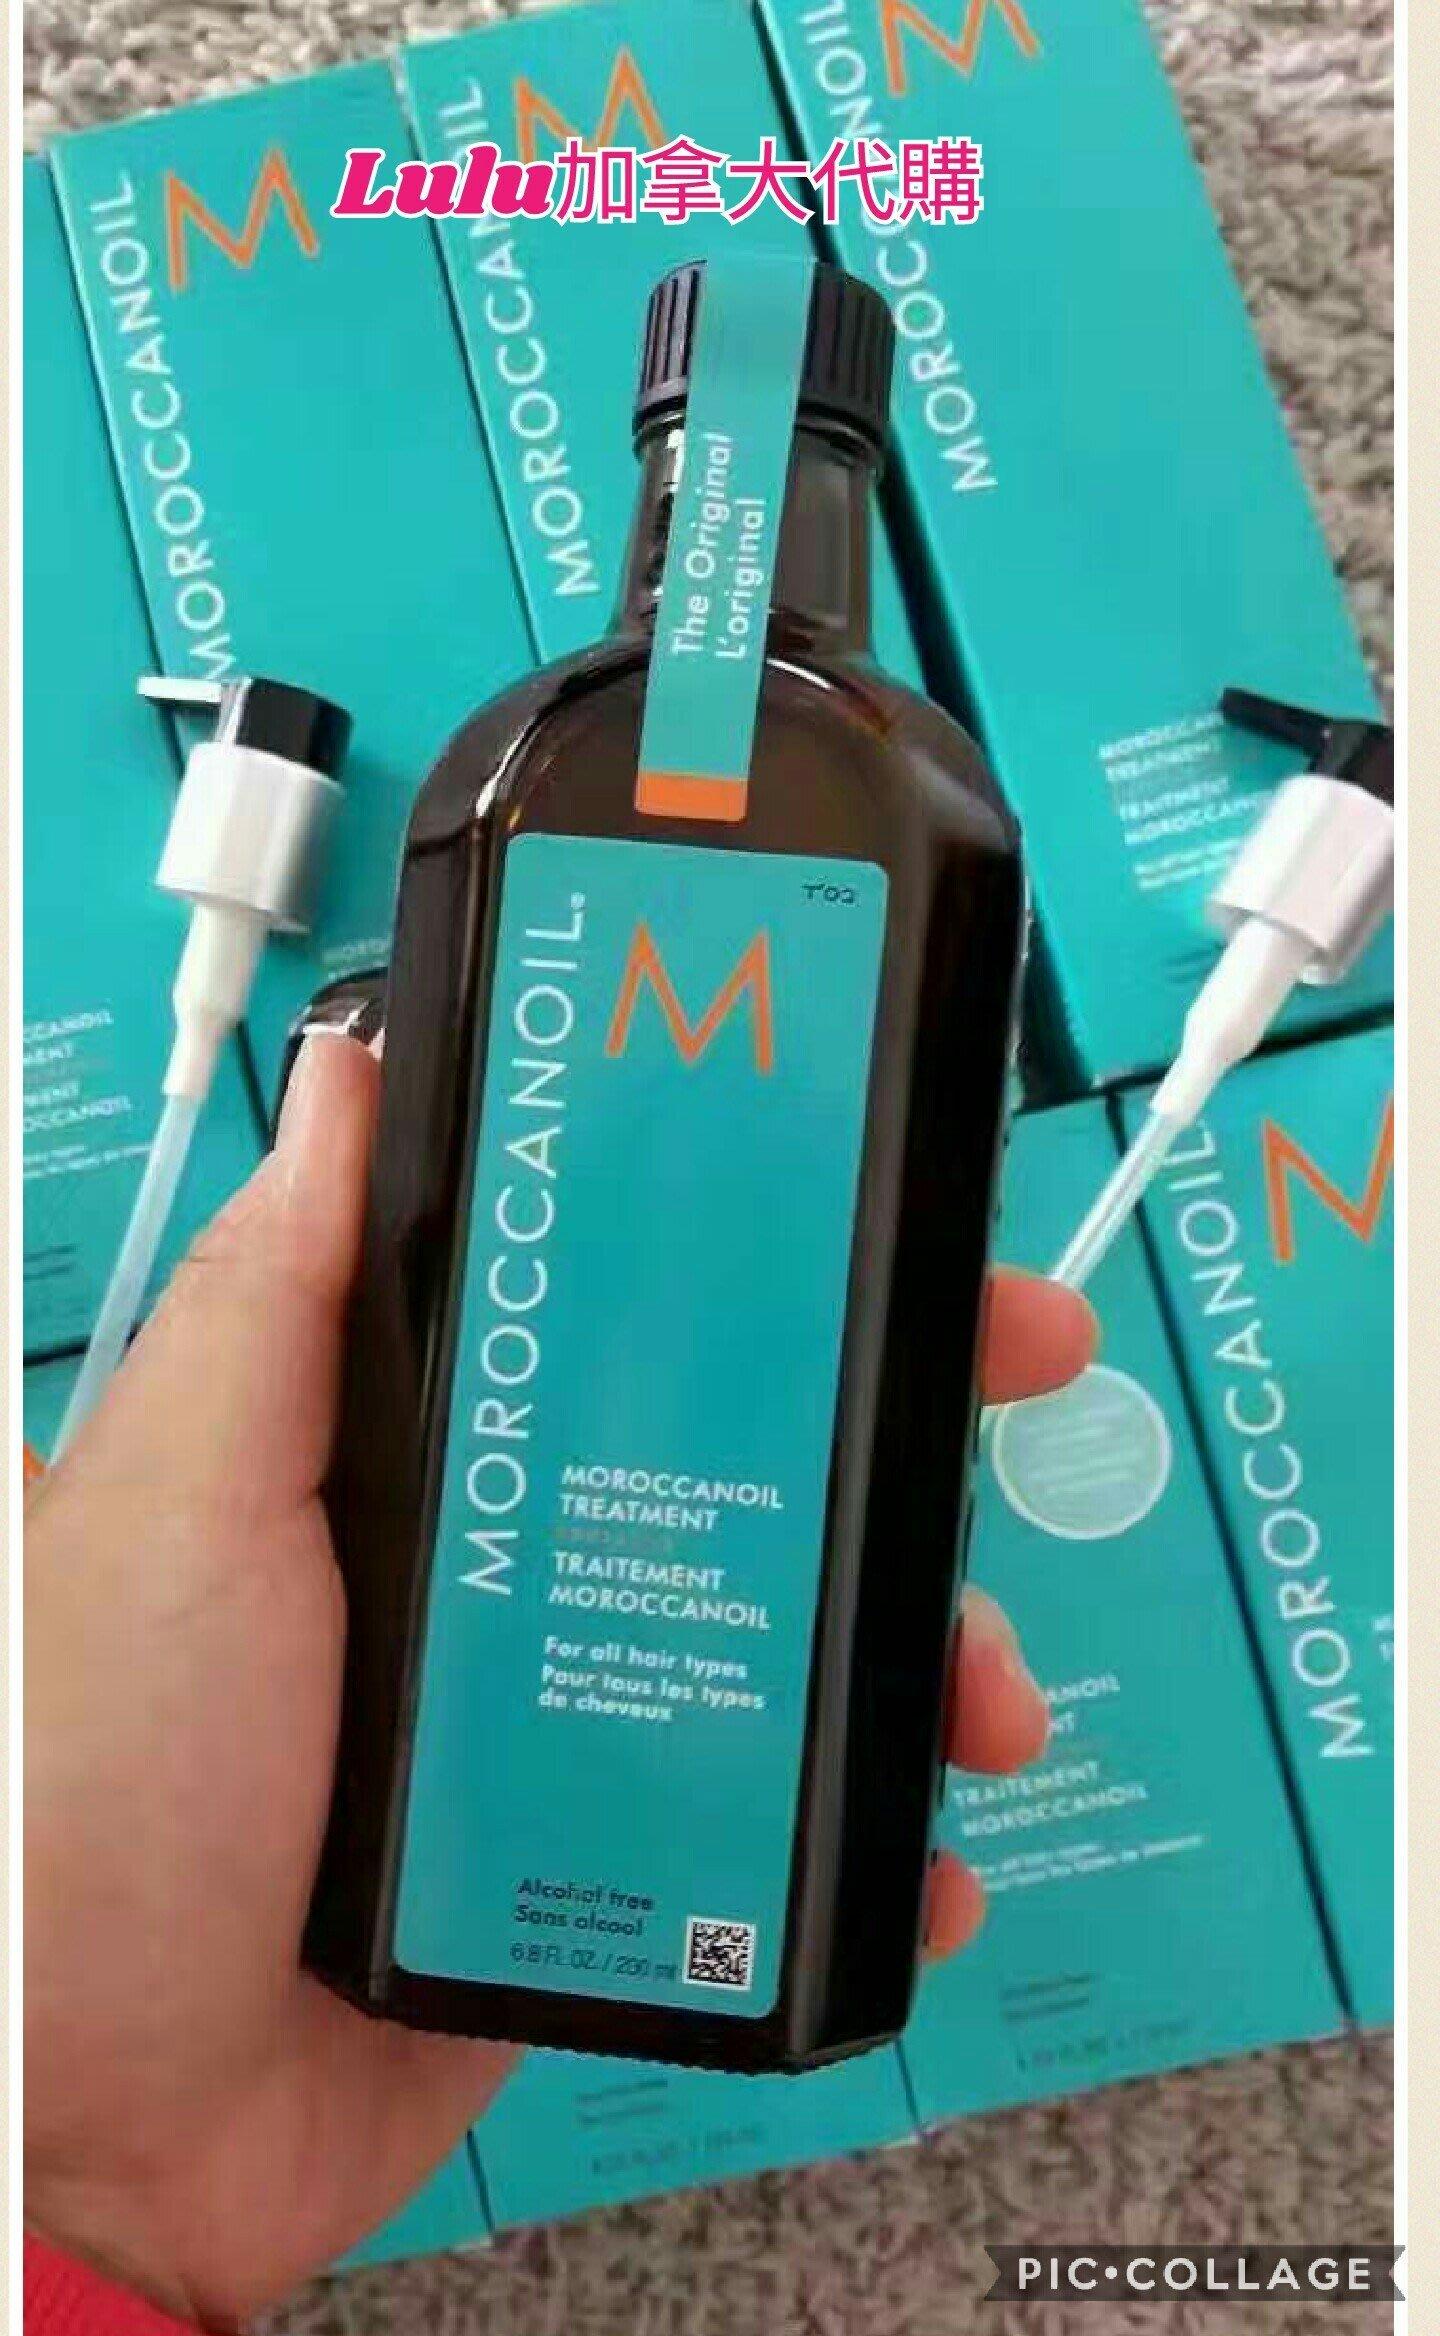 Moroccanoil 摩洛哥 優油 200ml 一般型 加拿大代購 聖誕節提前特價優惠活動數量有限